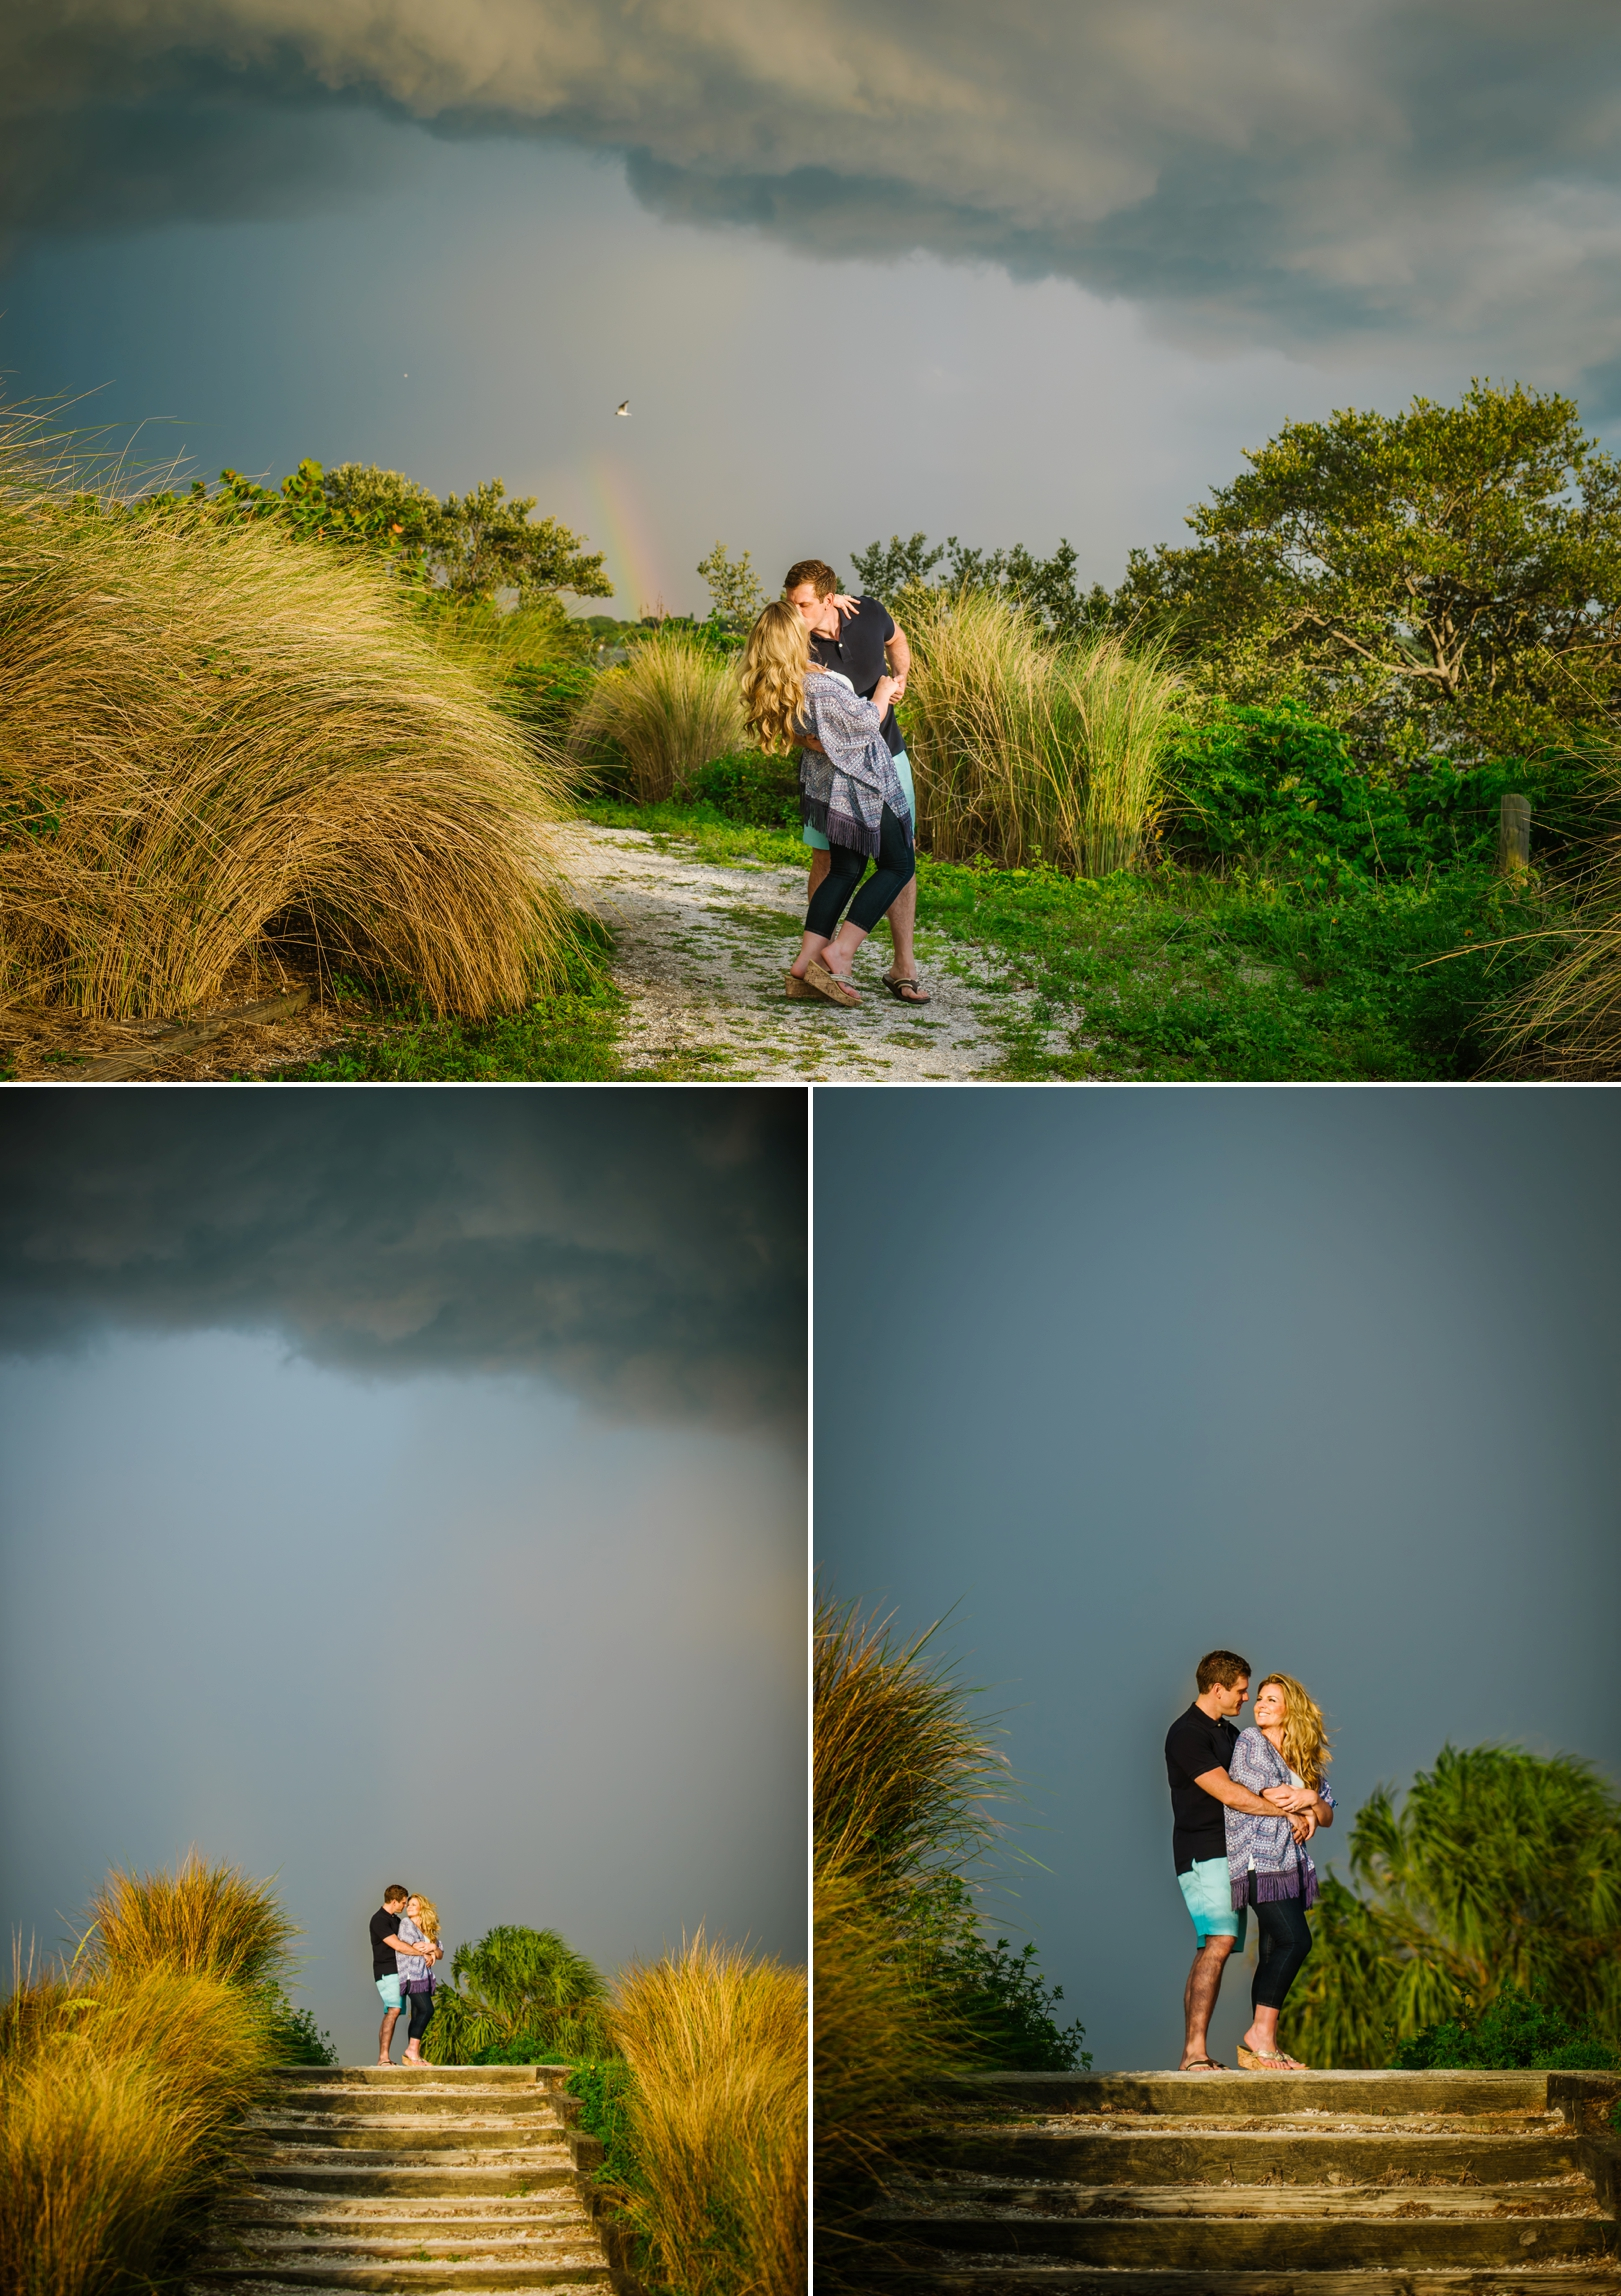 tampa-wedding-photographer-engagement-nature-outdoor-florida_0005.jpg